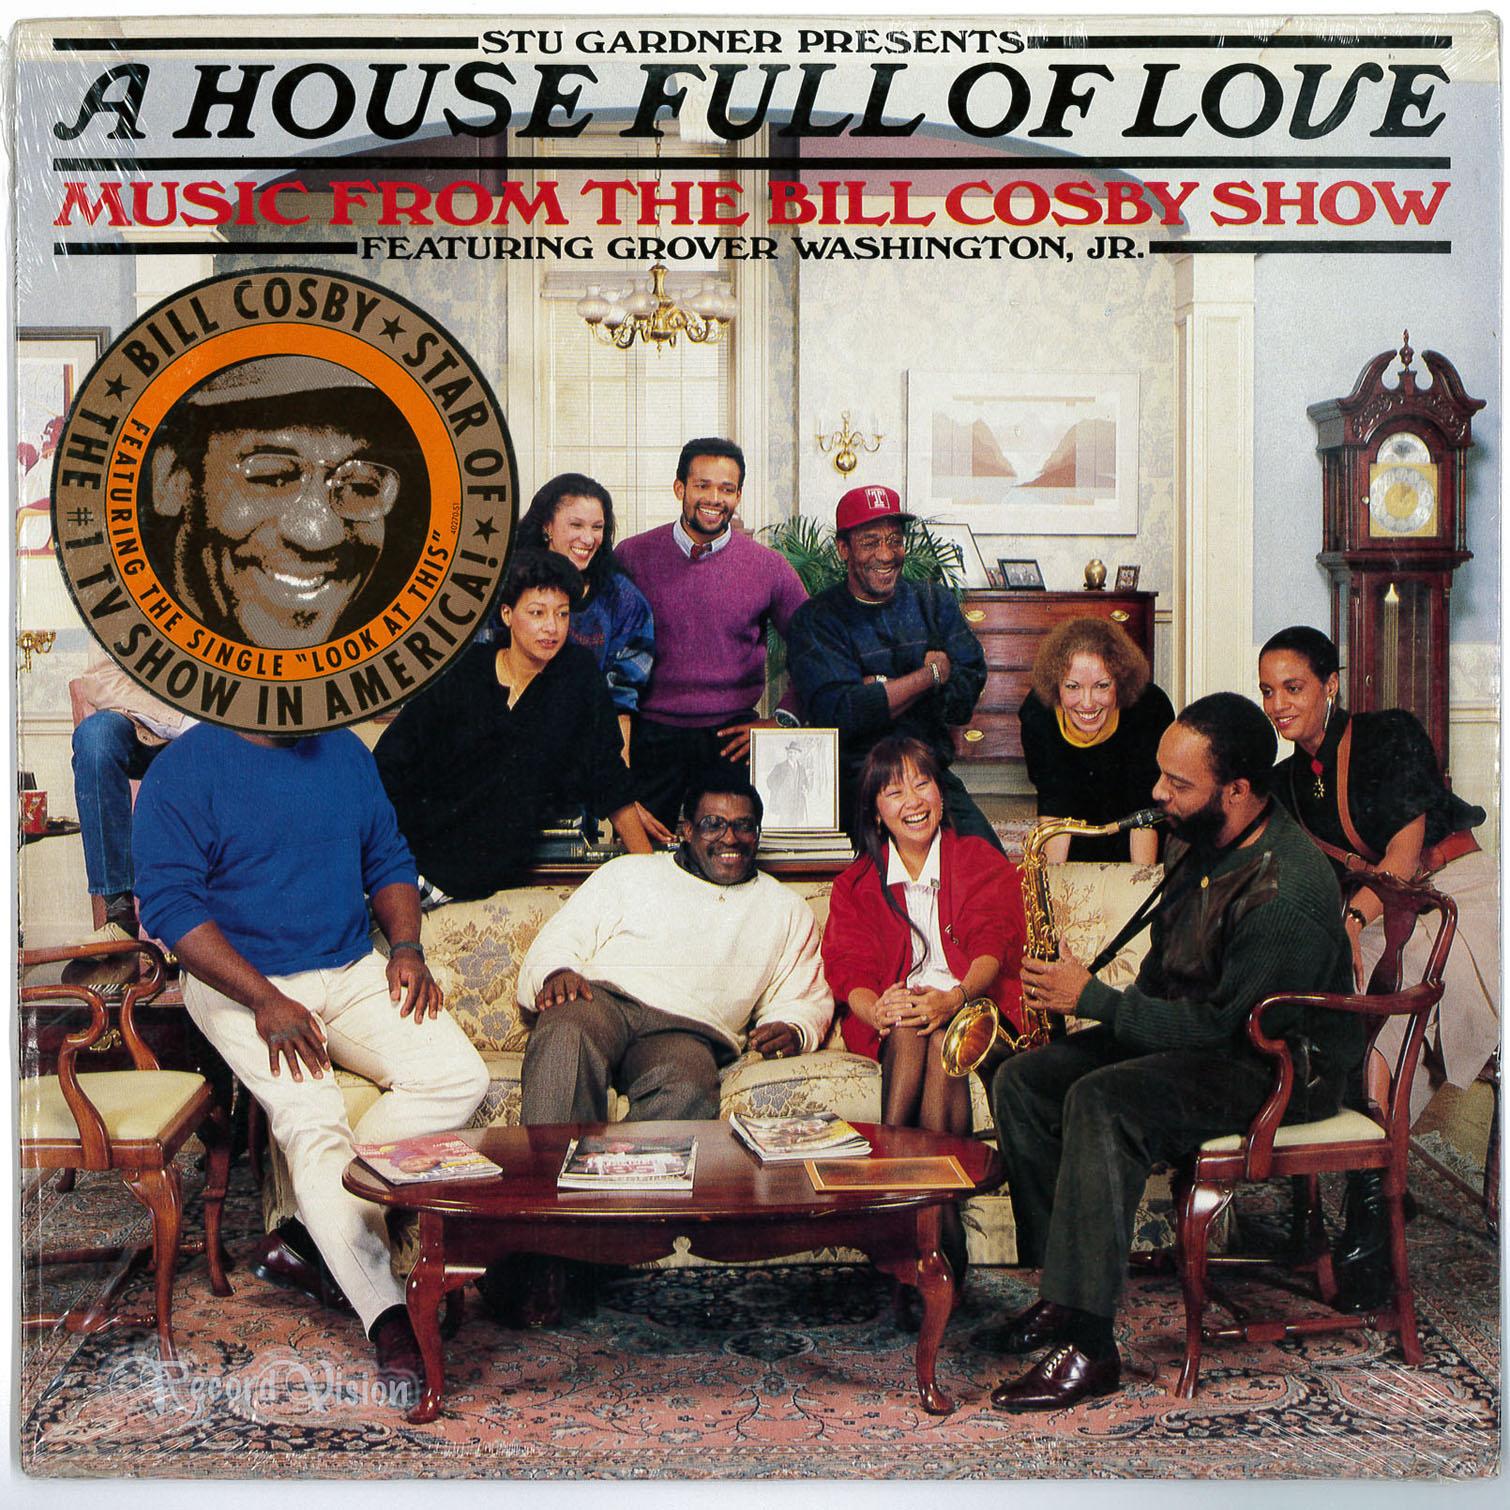 GROVER WASHINGTON, JR. - A House Full of Love - 33T